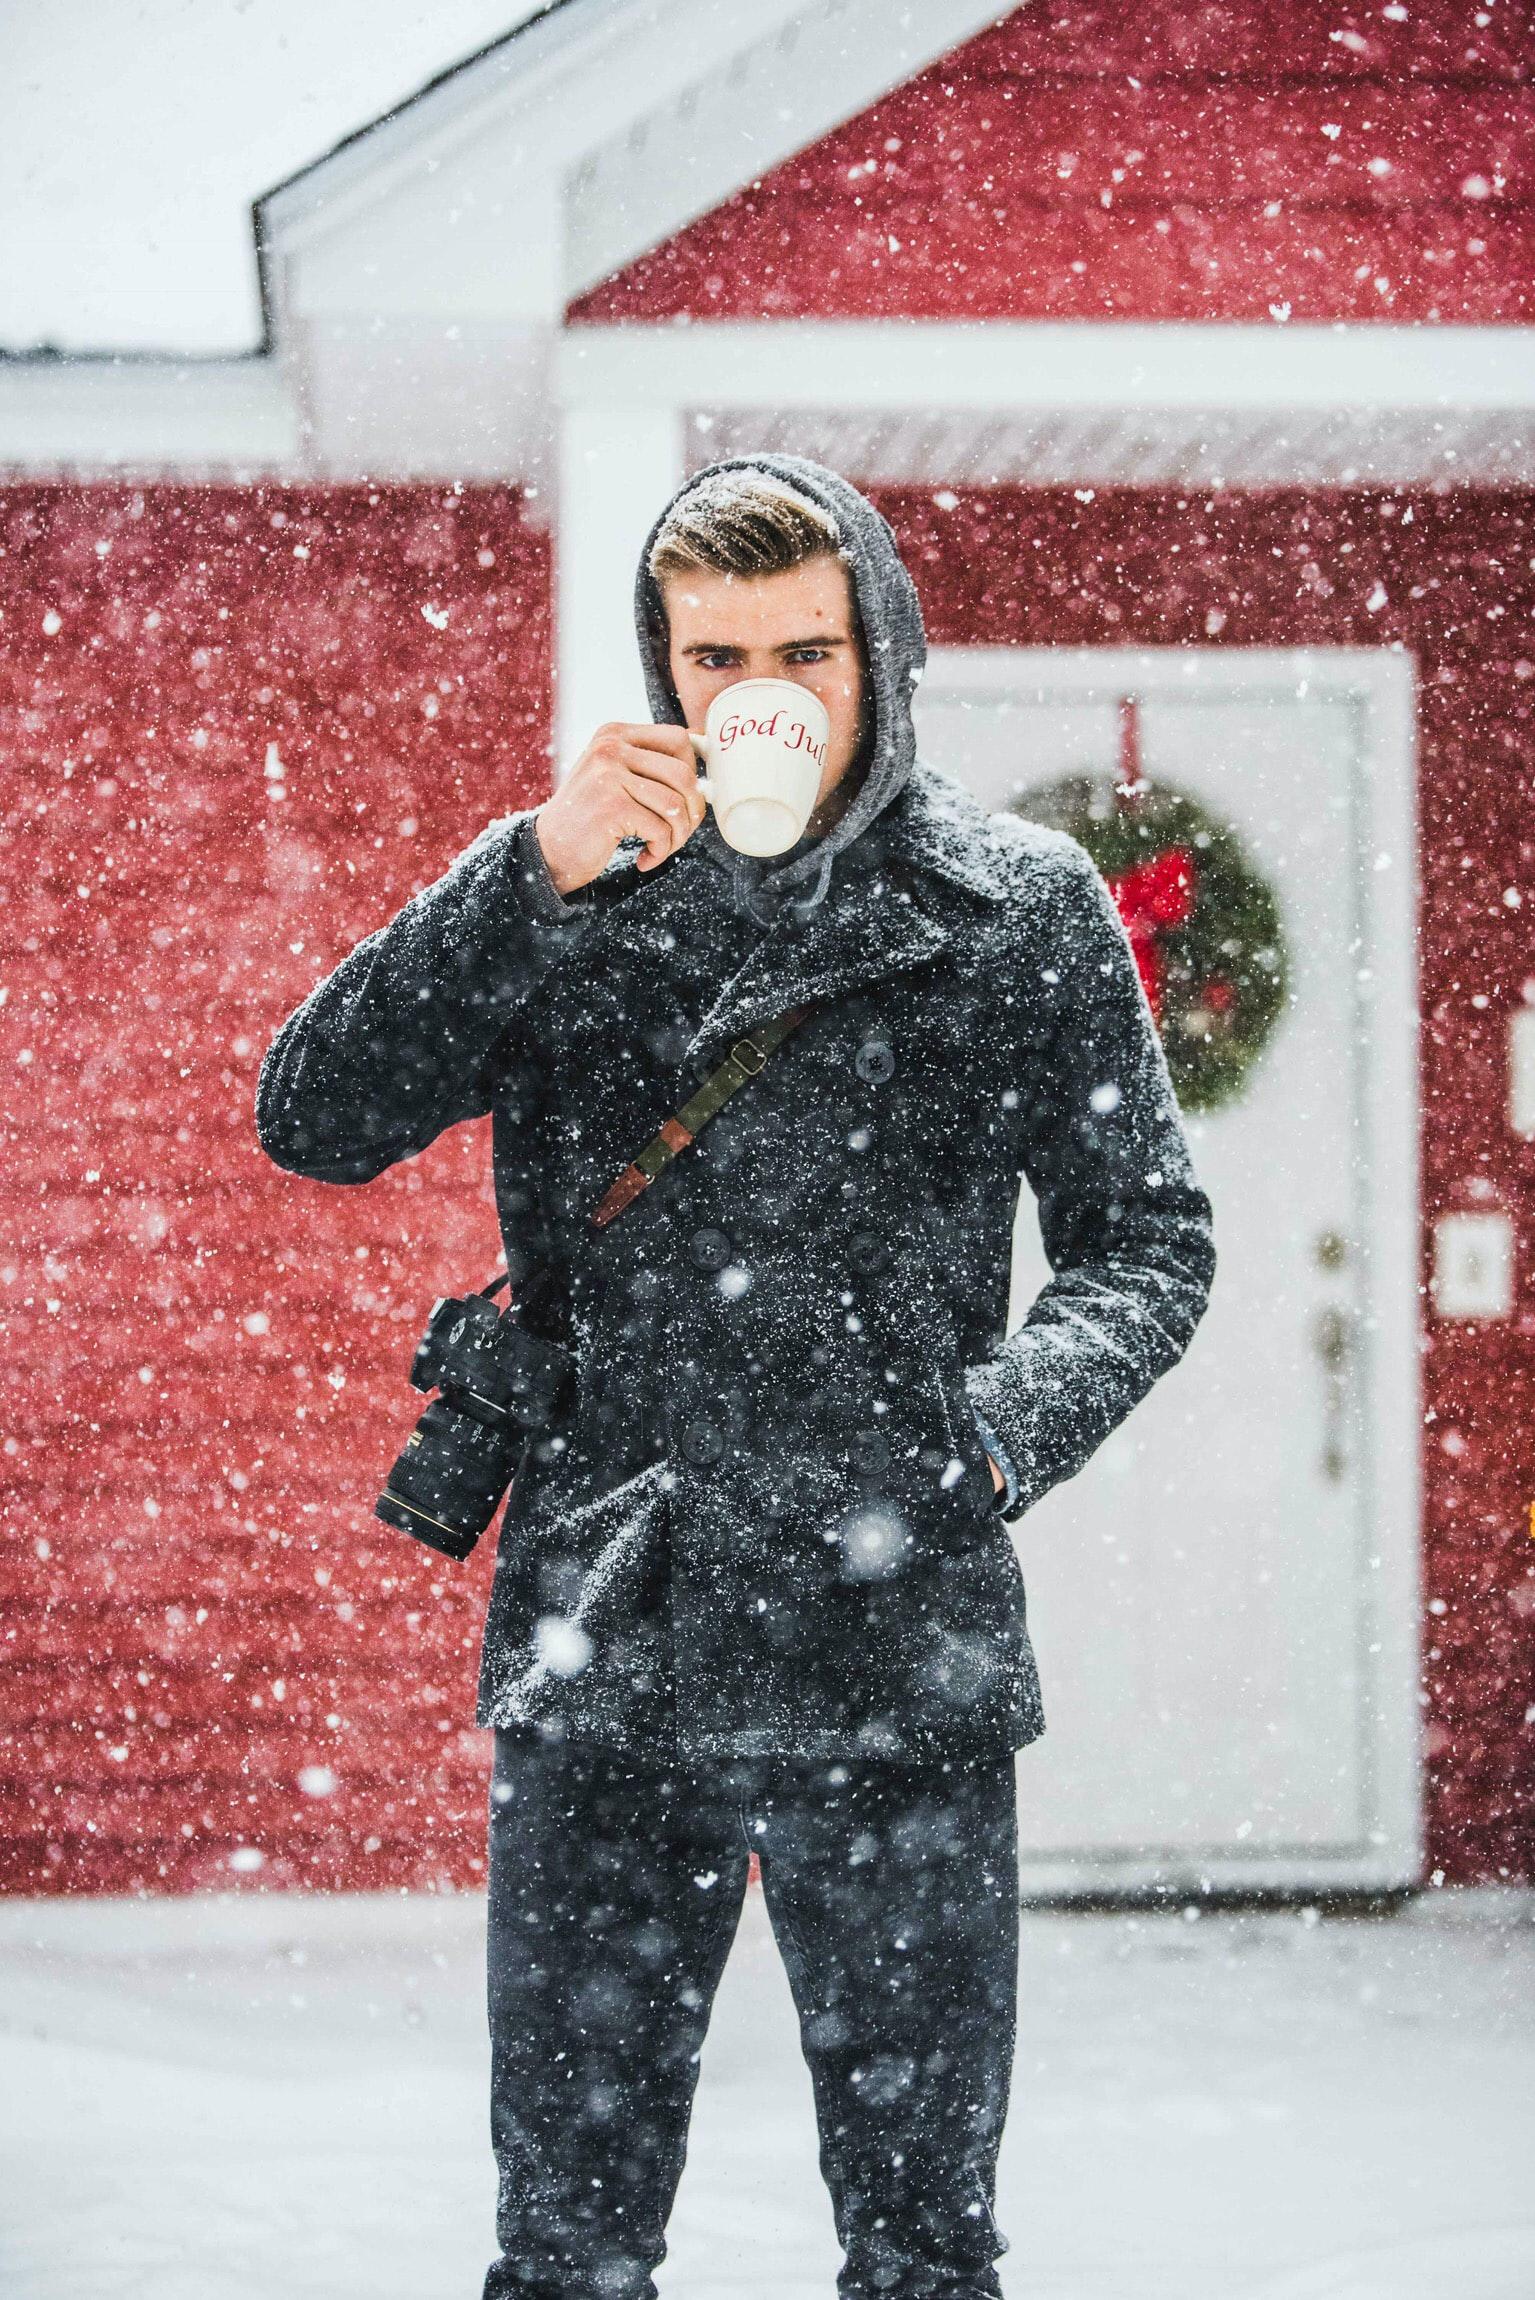 fotografo-navidad-nieve